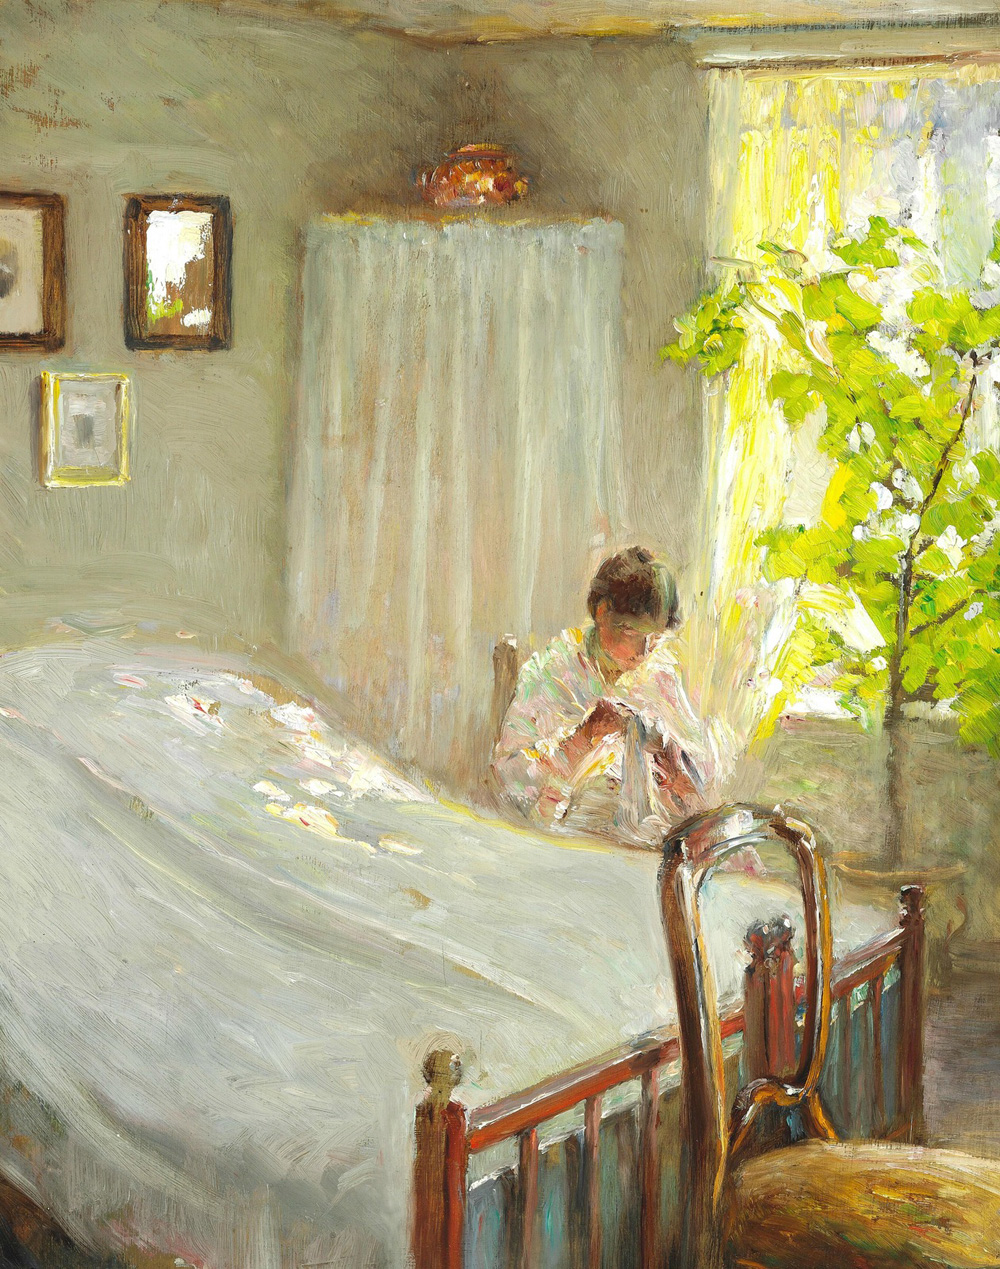 1916_ZENSINA-V-INTERERE-A-woman-in-a-sunlit-interior_40-K-33_D.M._CASTNOE-SOBRANIE.jpg